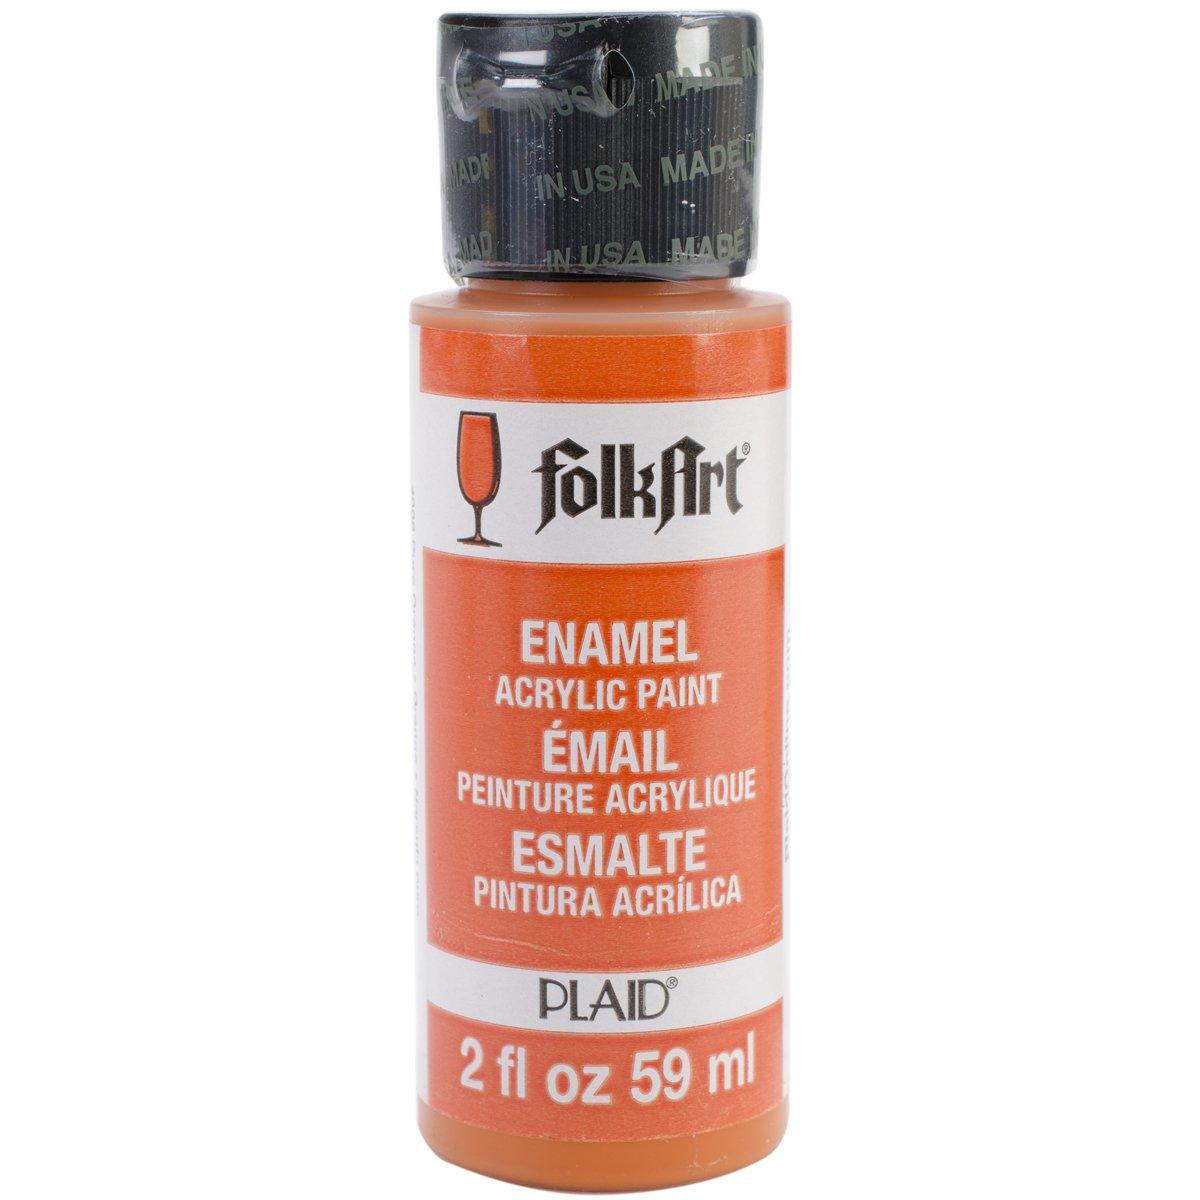 FolkArt Enamel Glass & Ceramic Paint in Assorted Colors (2 oz), 4008, Pure Orange